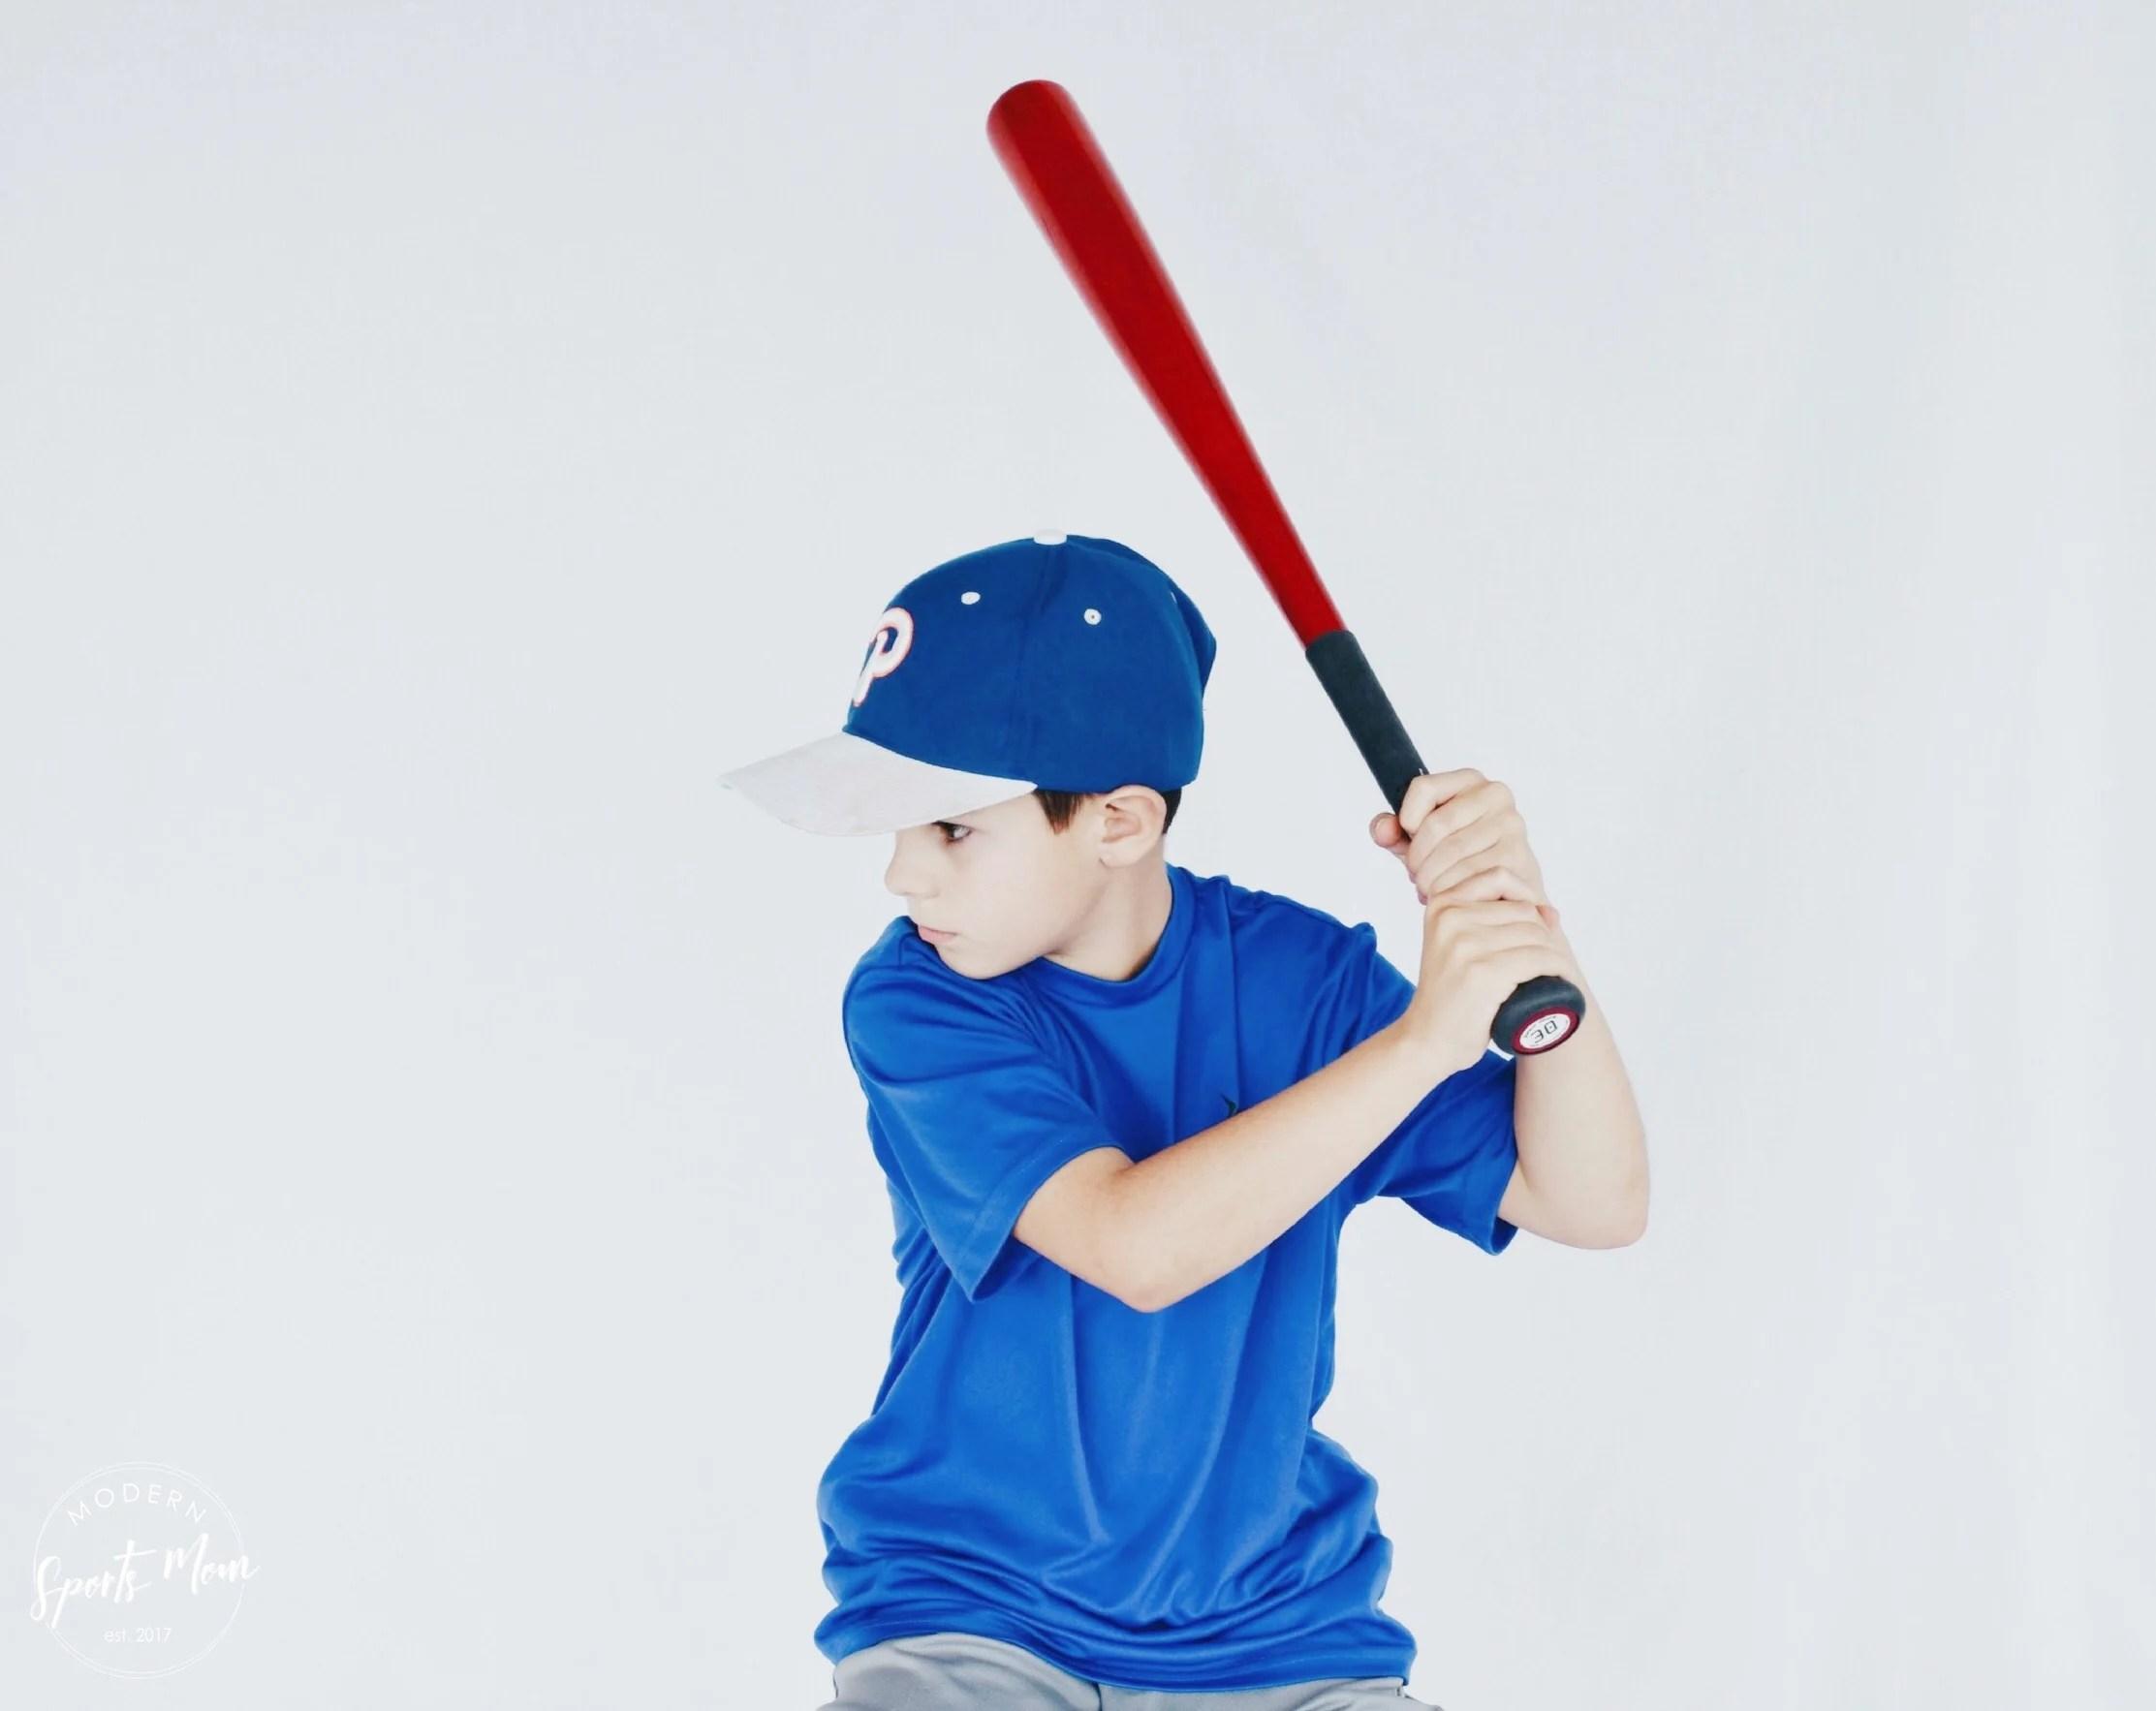 Youth baseball player using Sniper Skin bat grip!